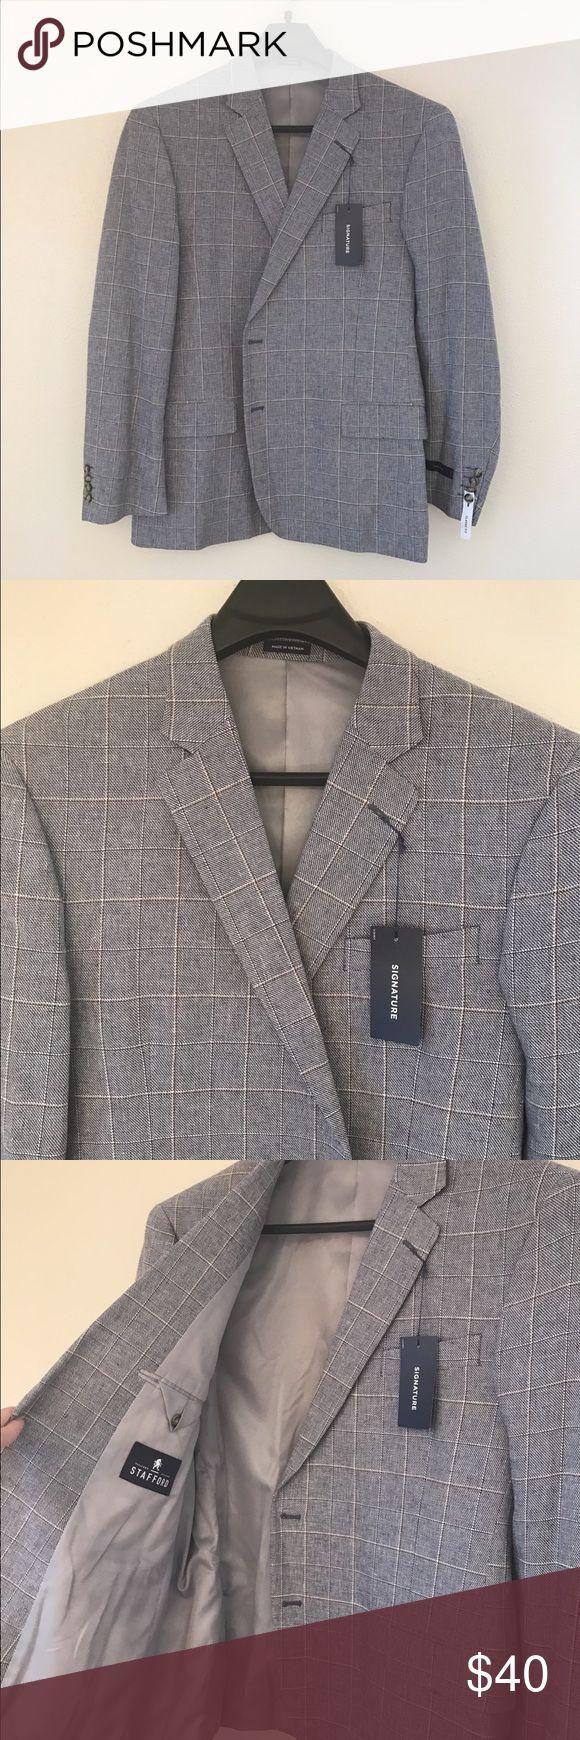 Men's Stafford Sport Coat Men's Stafford sports coat. Signature design in classic fit. stafford Suits & Blazers Sport Coats & Blazers